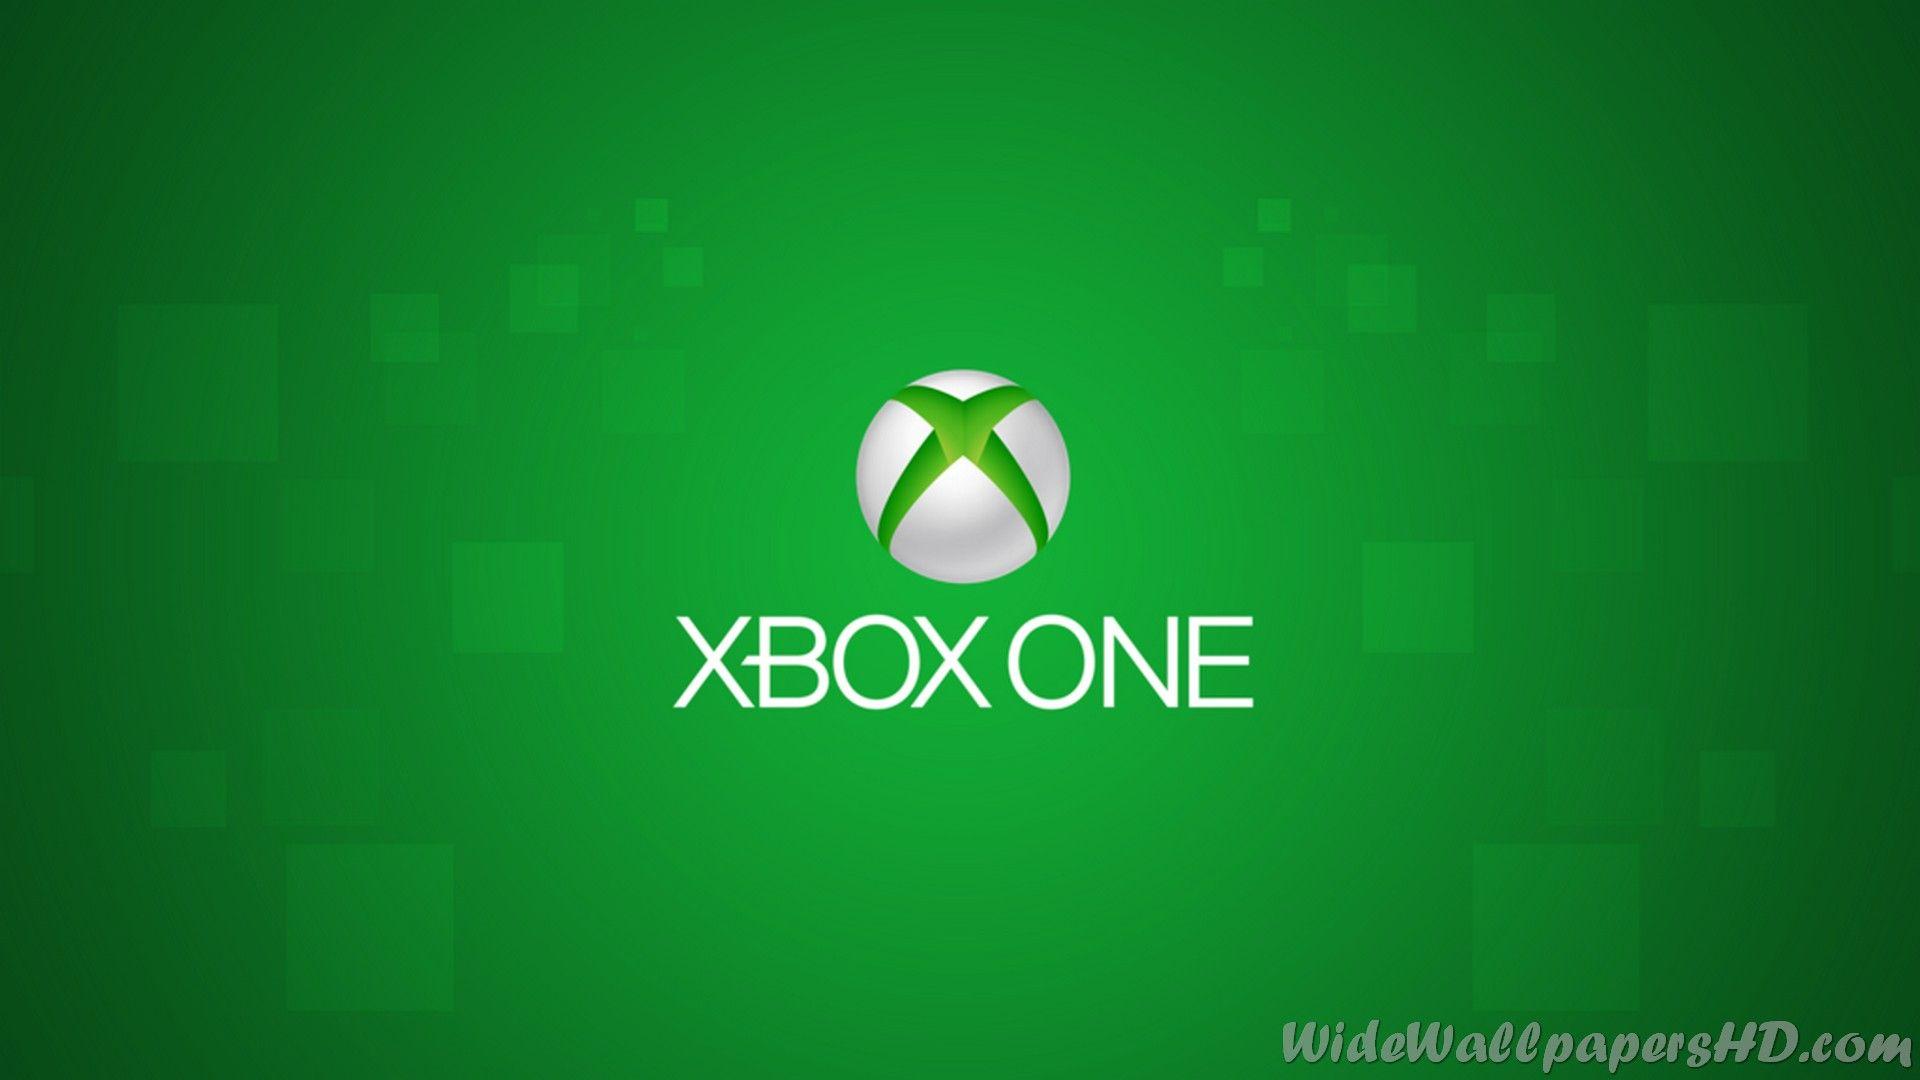 Xbox One Hd Images Xbox One Xbox Xbox Logo